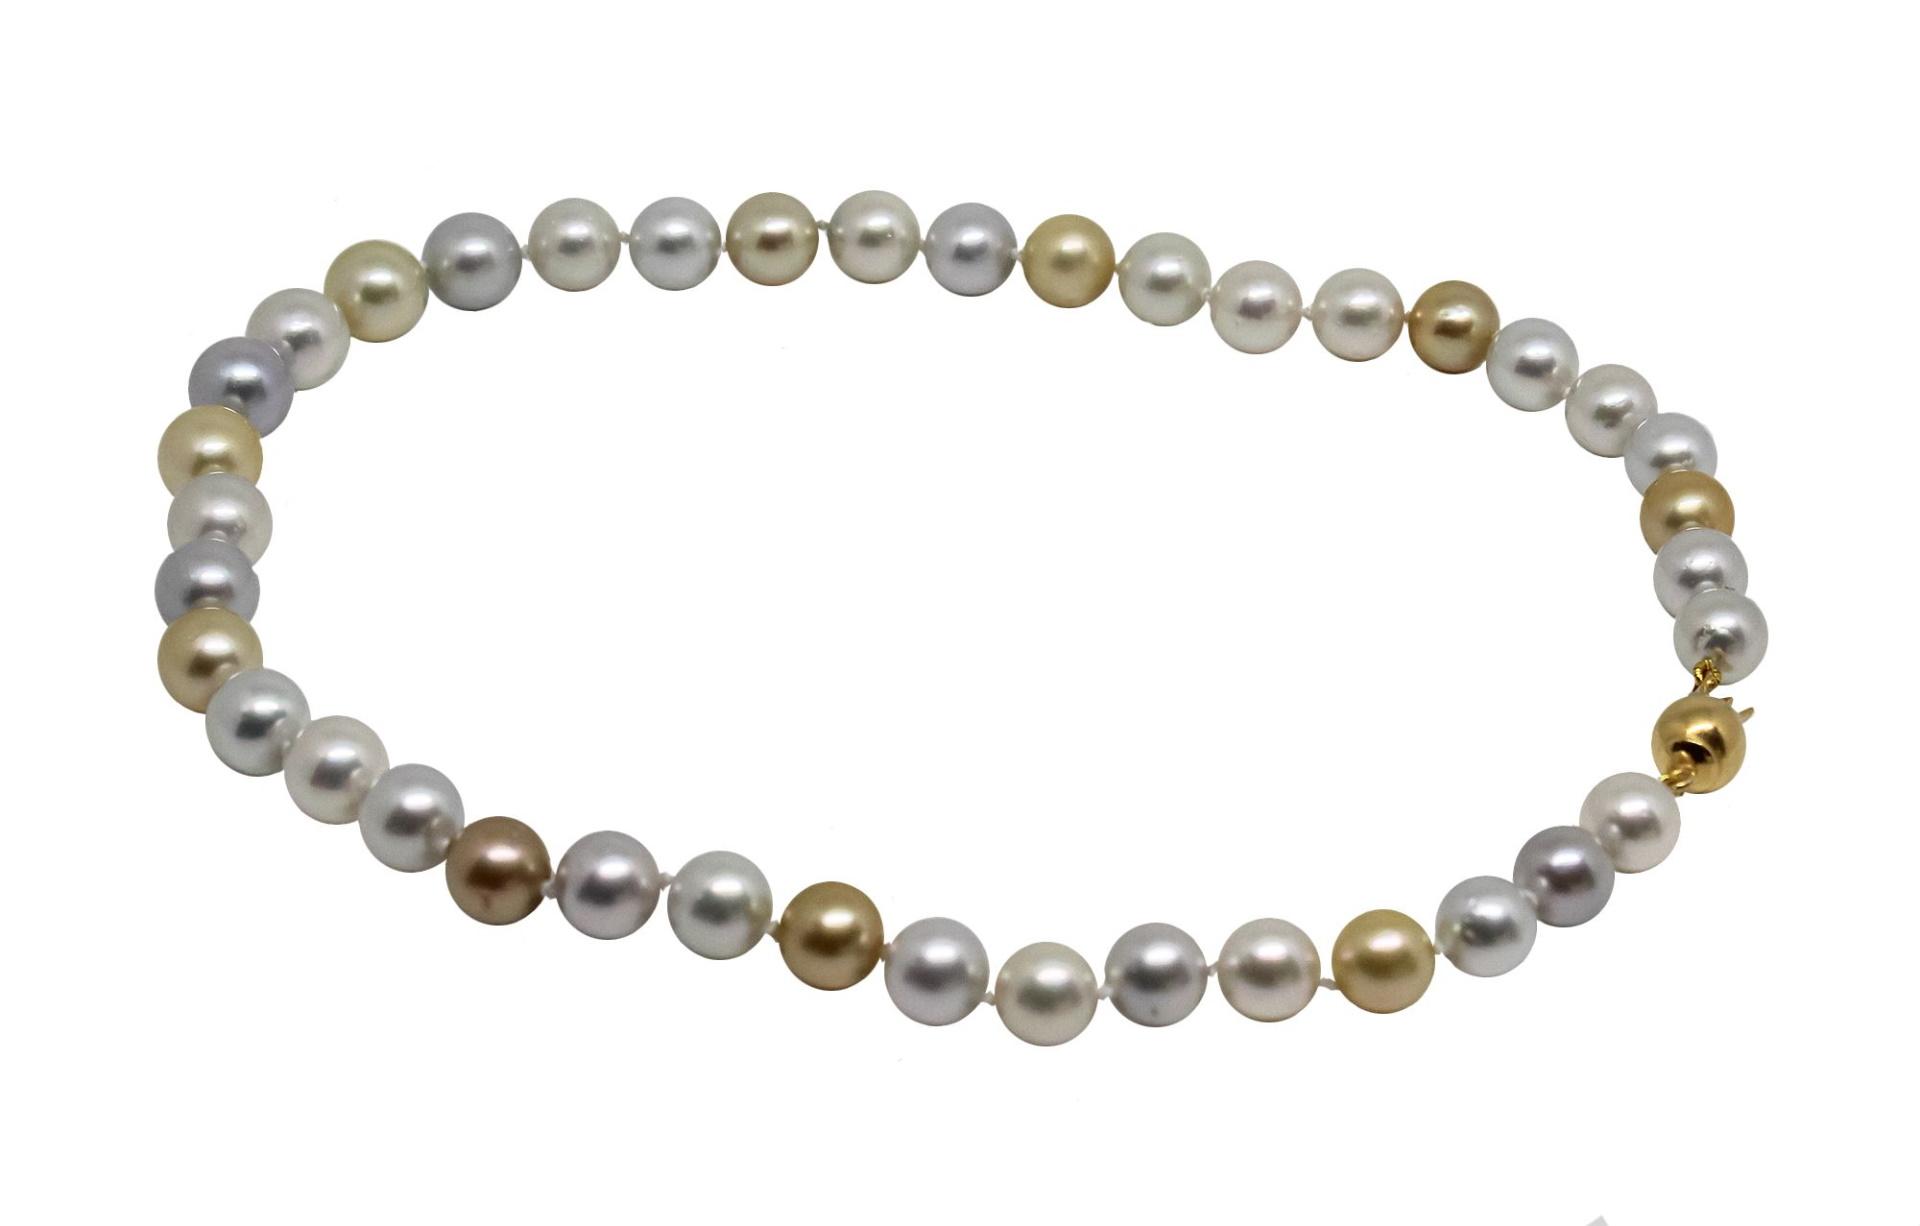 GEMSMU1155216 COLLANA DONNA 39 PERLE NATURALI MULTICOLORE 2 1stAmerican jewerly collana 39 perle naturali multicolore Ø9x118mm con chiusura in argento ag925